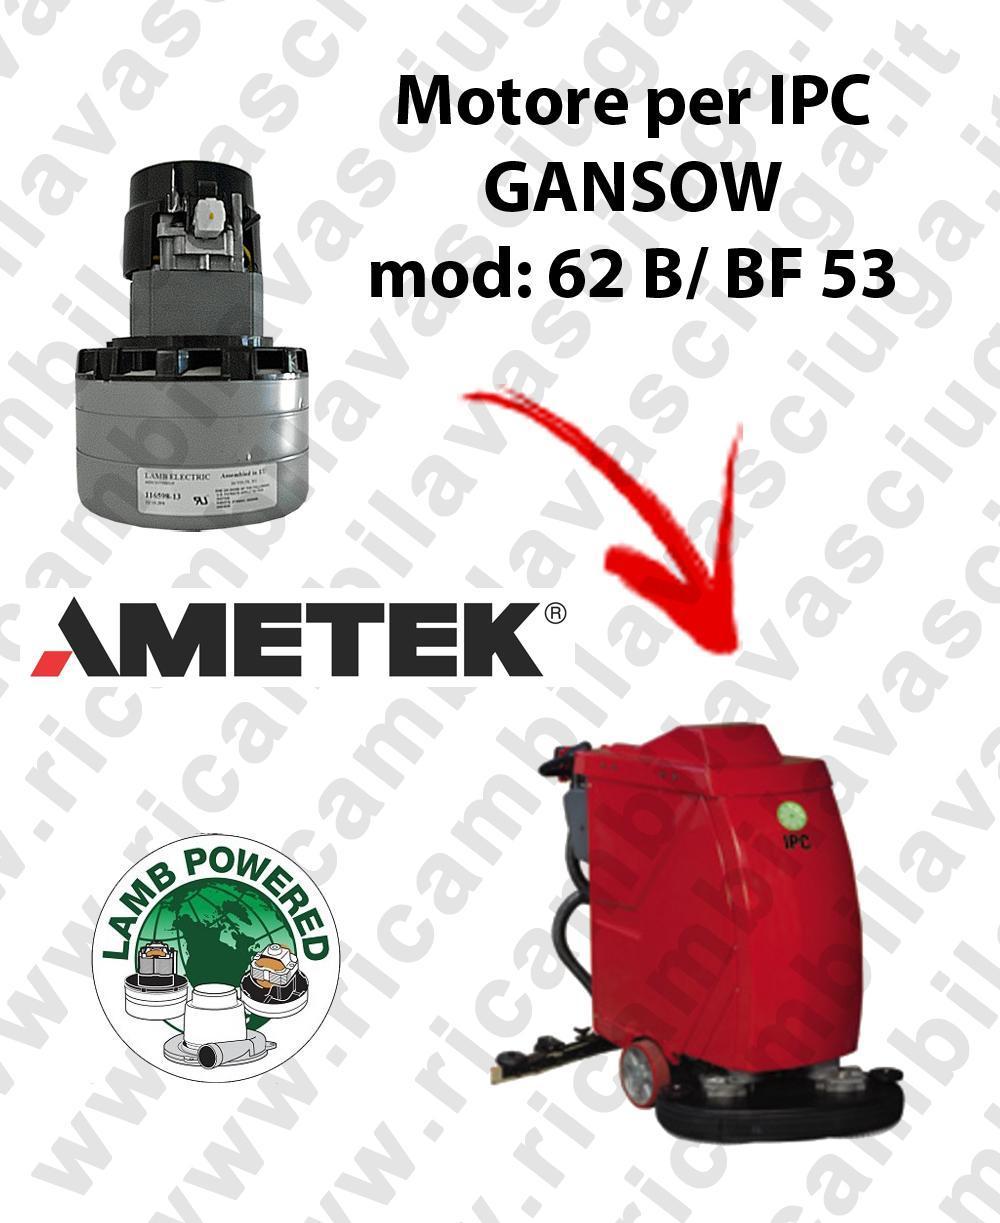 62 B/BF 53 Saugmotor LAMB AMETEK für scheuersaugmaschinen IPC GANSOW